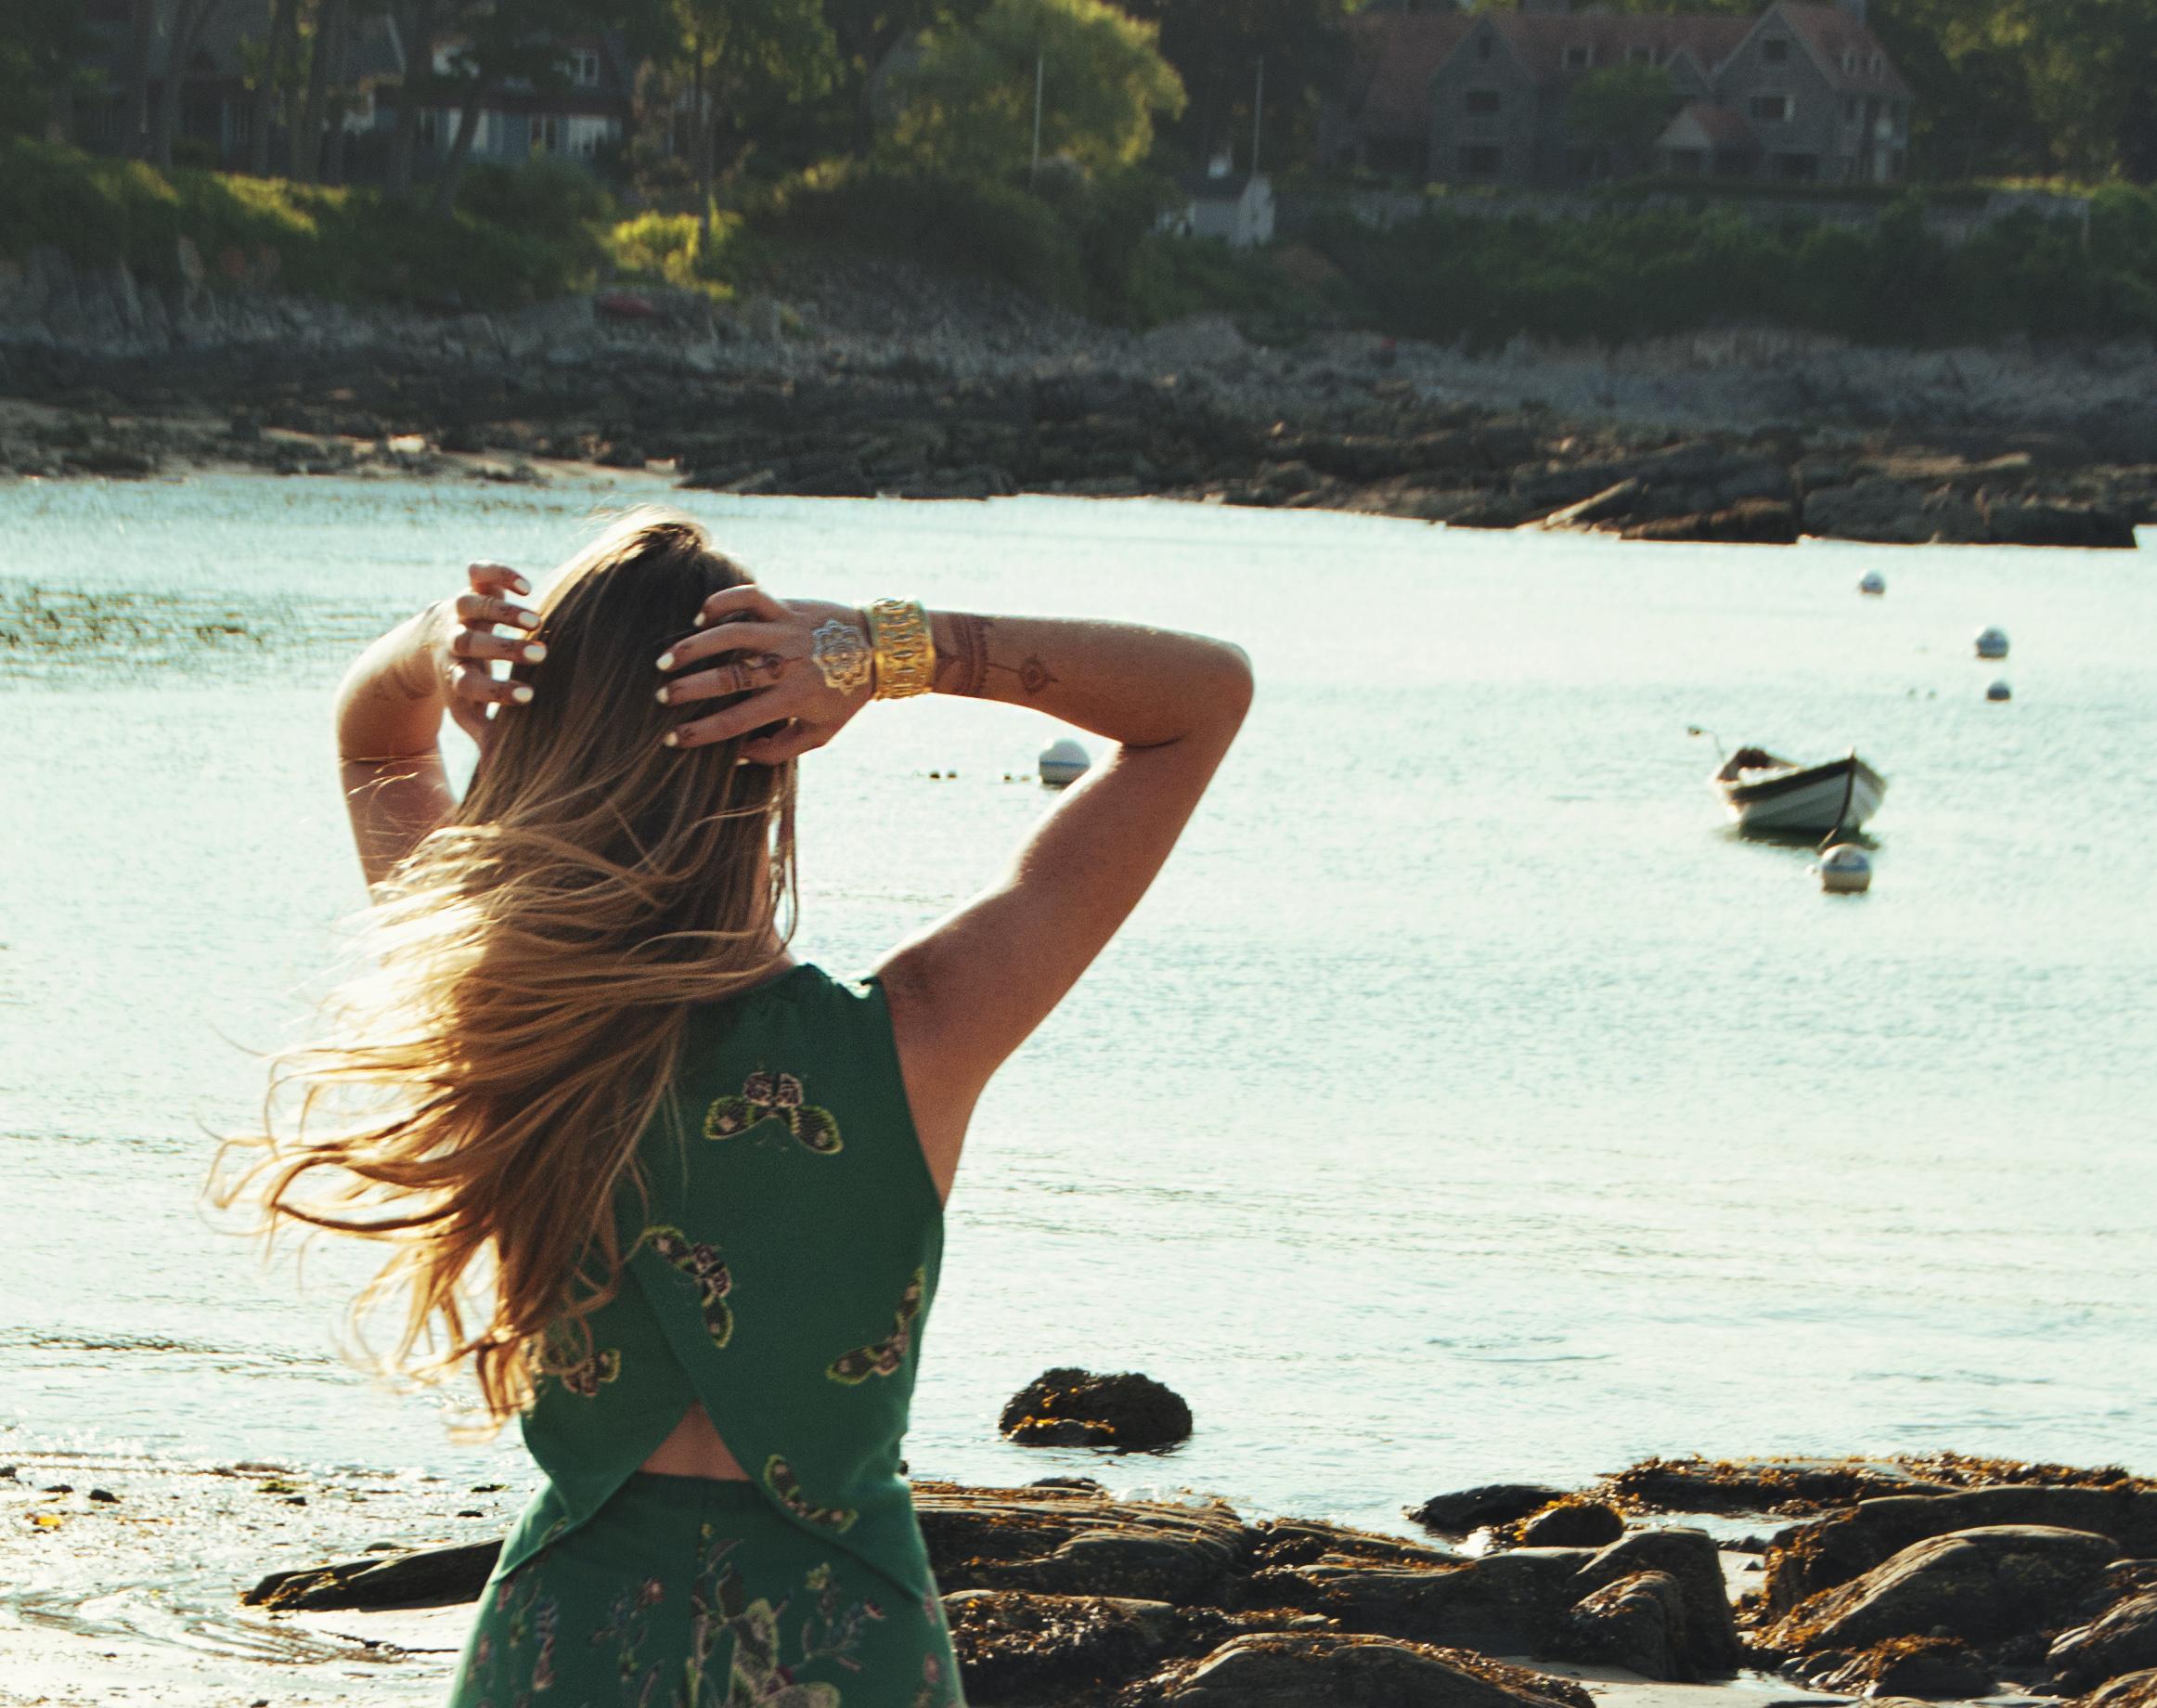 Green Romper (via Girl x Garment)